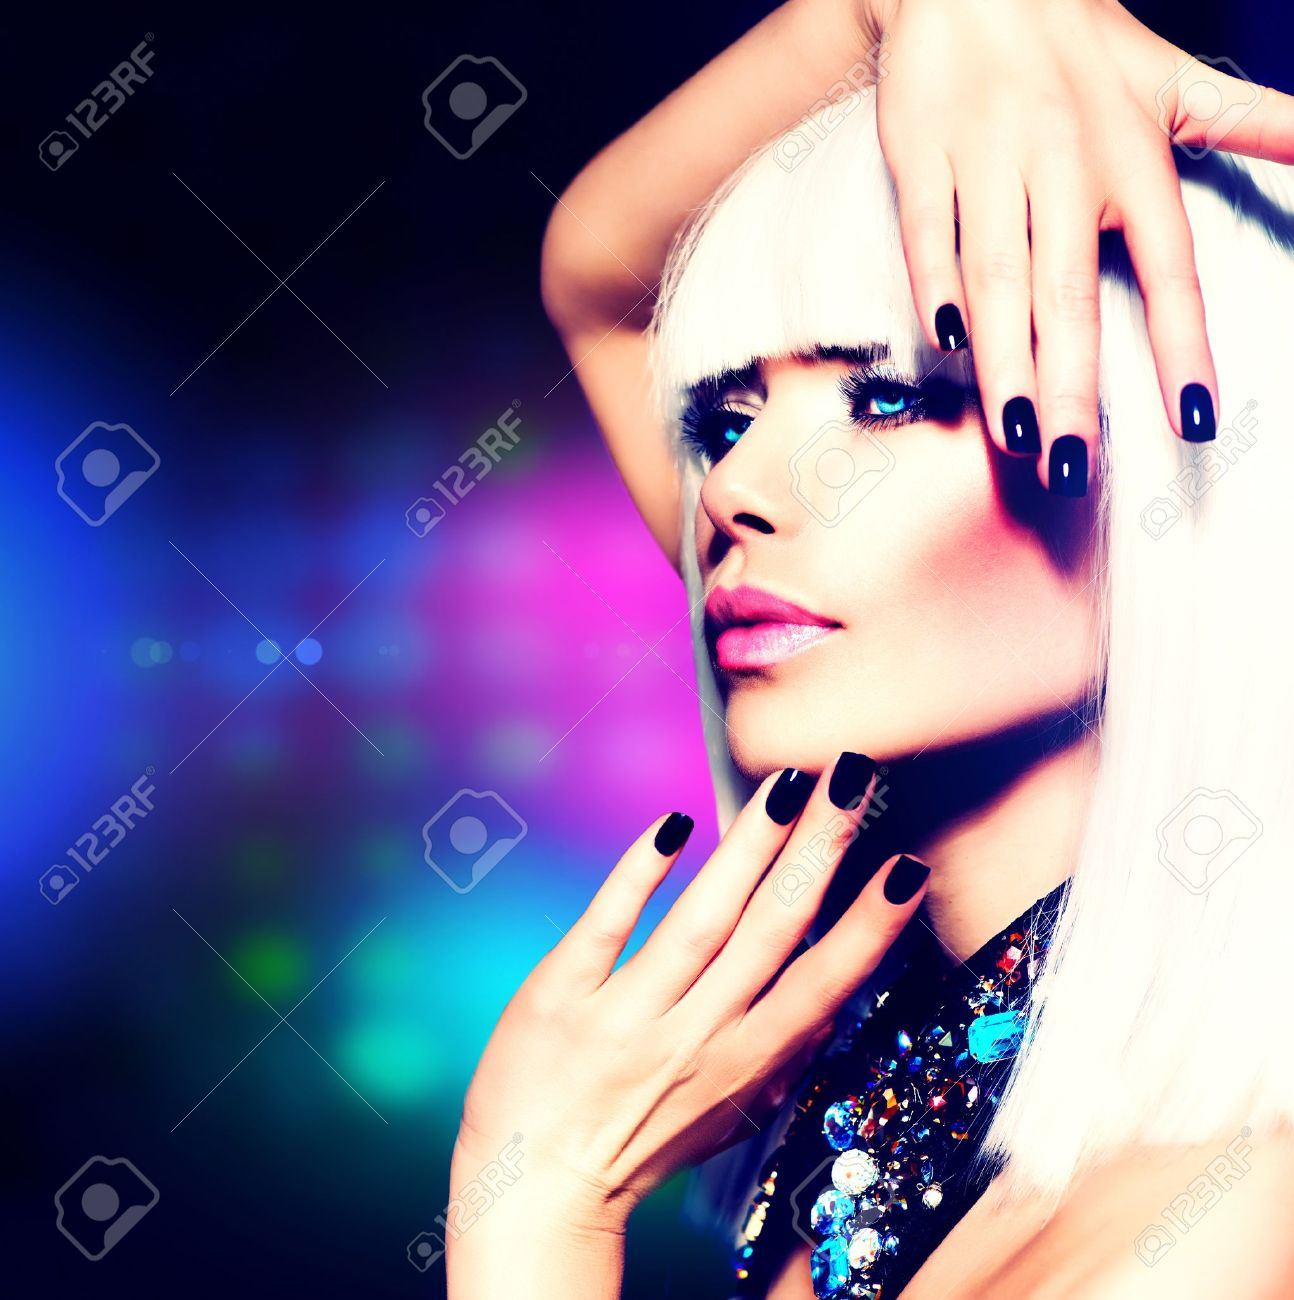 Fashion Disco Party Girl Portrait  Purple Makeup and White Hair Stock Photo - 19225020